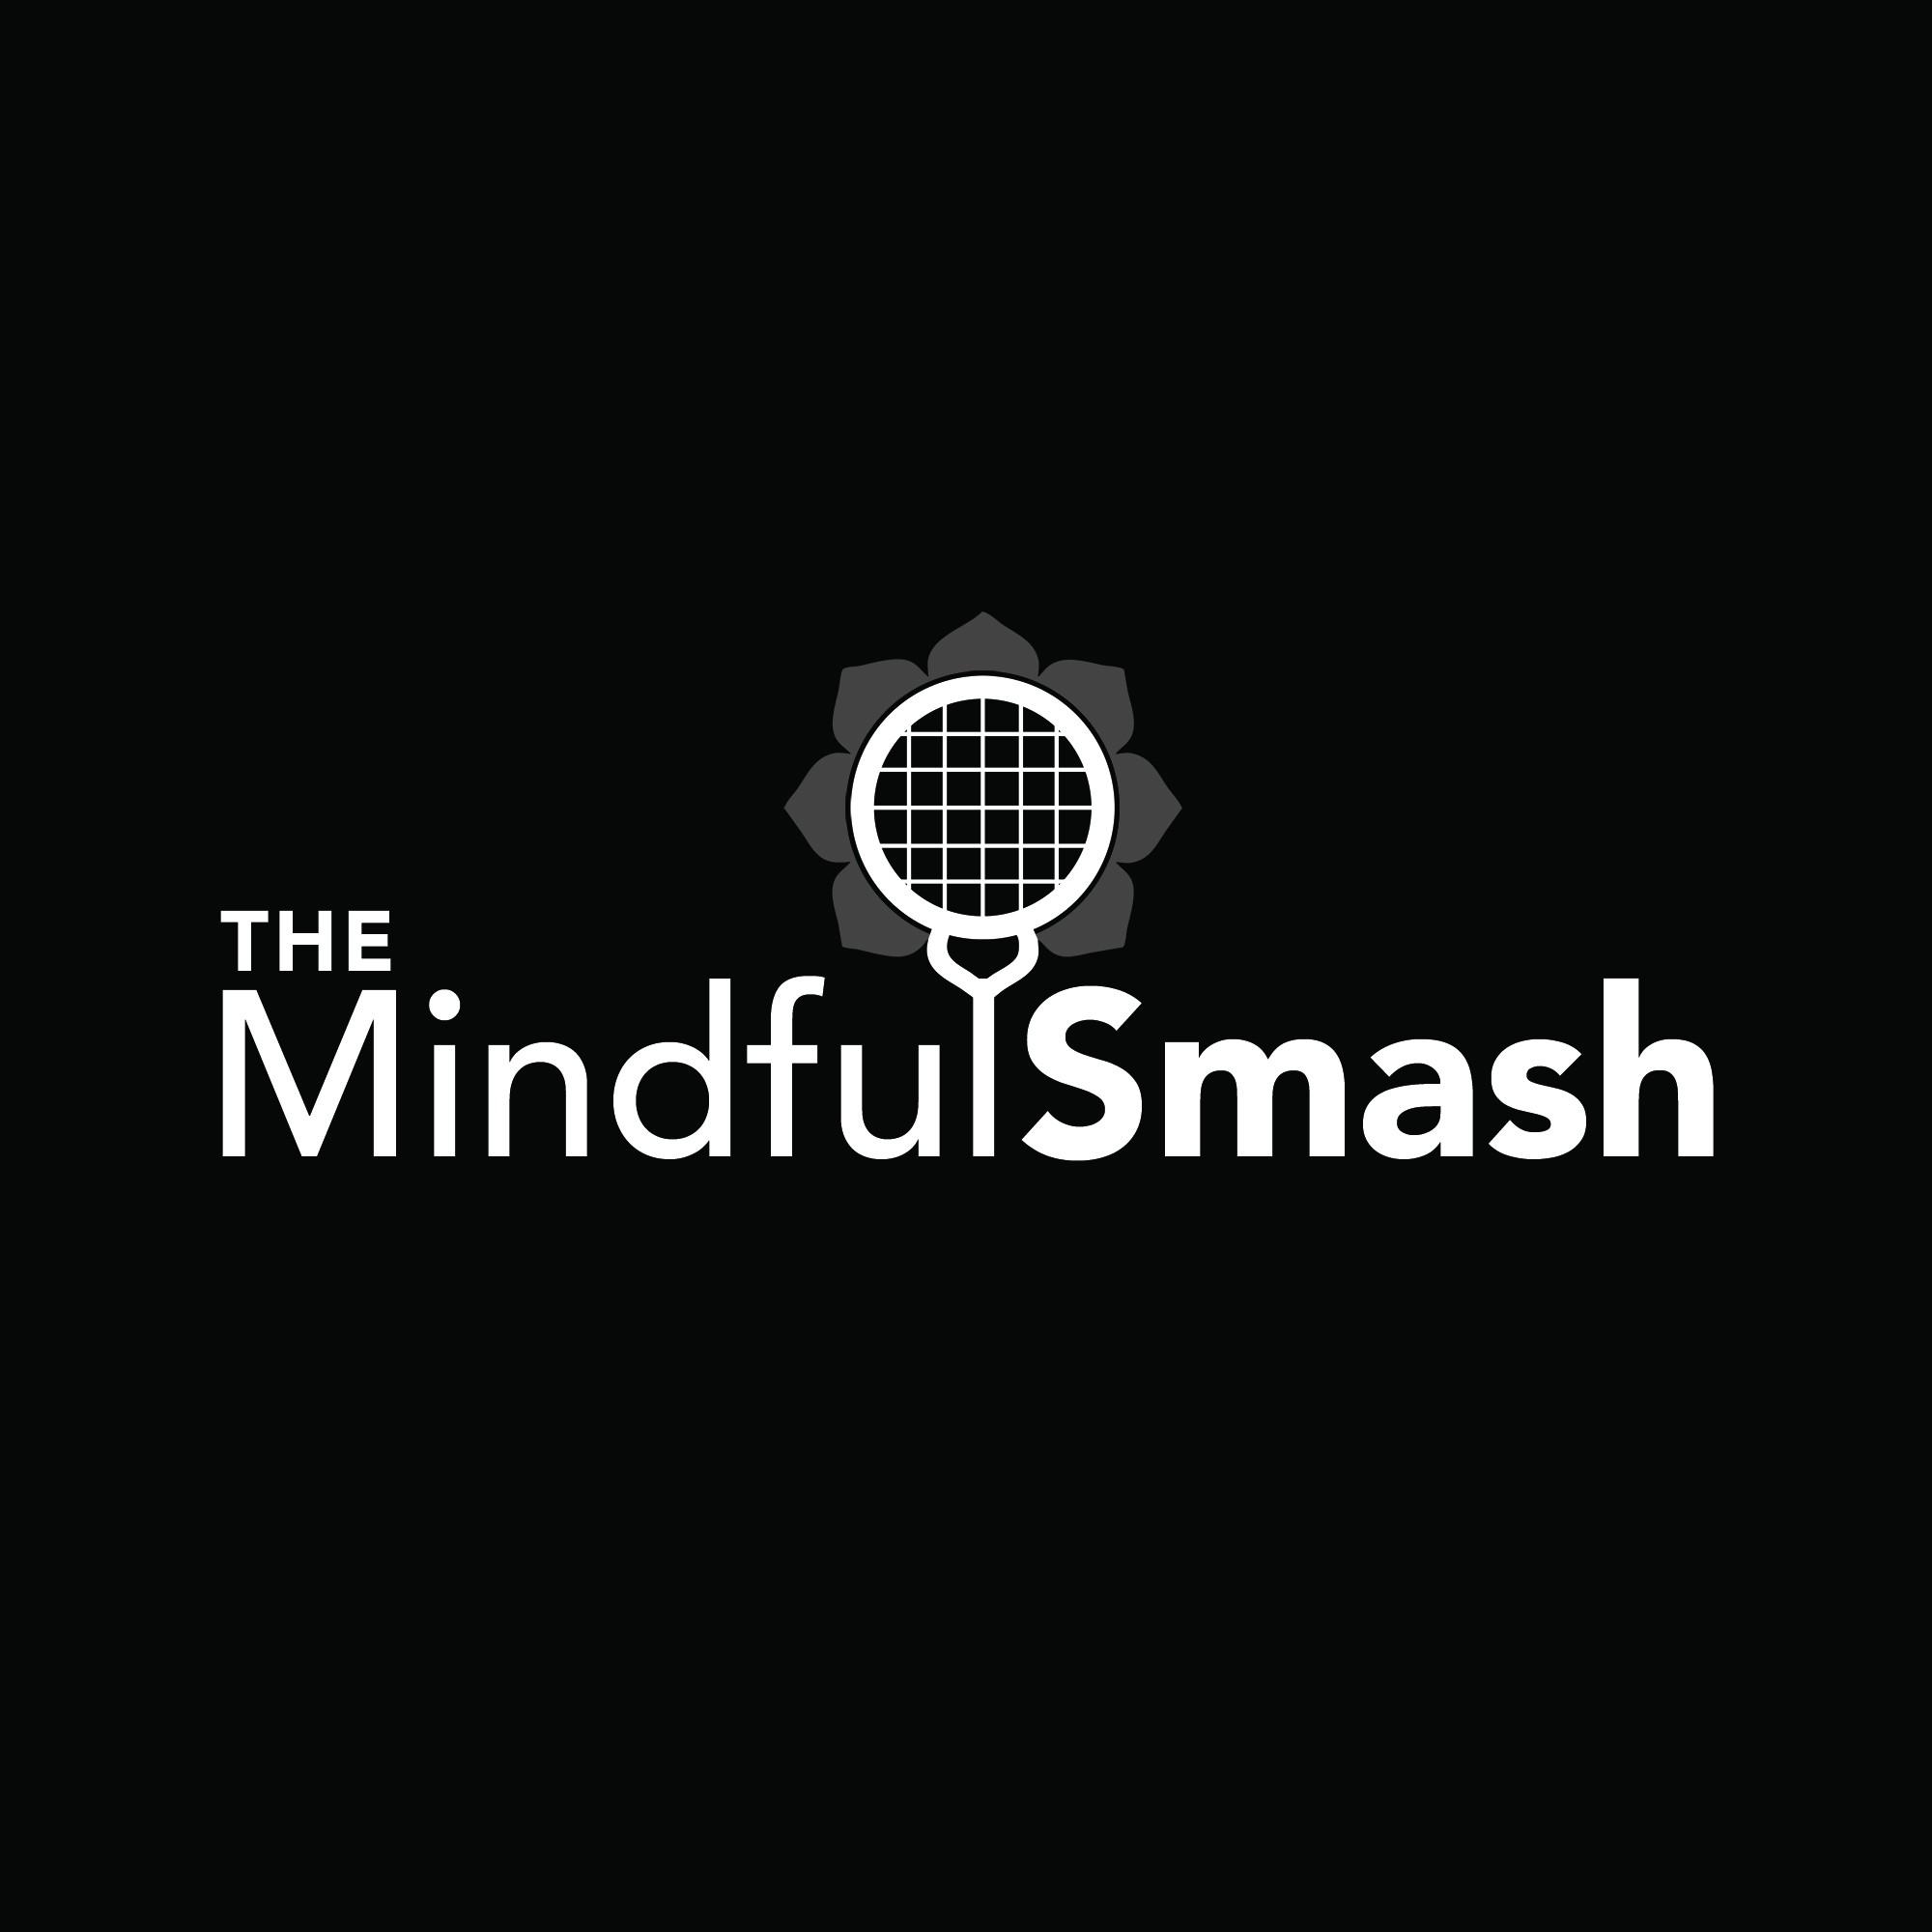 The Mindful Smash